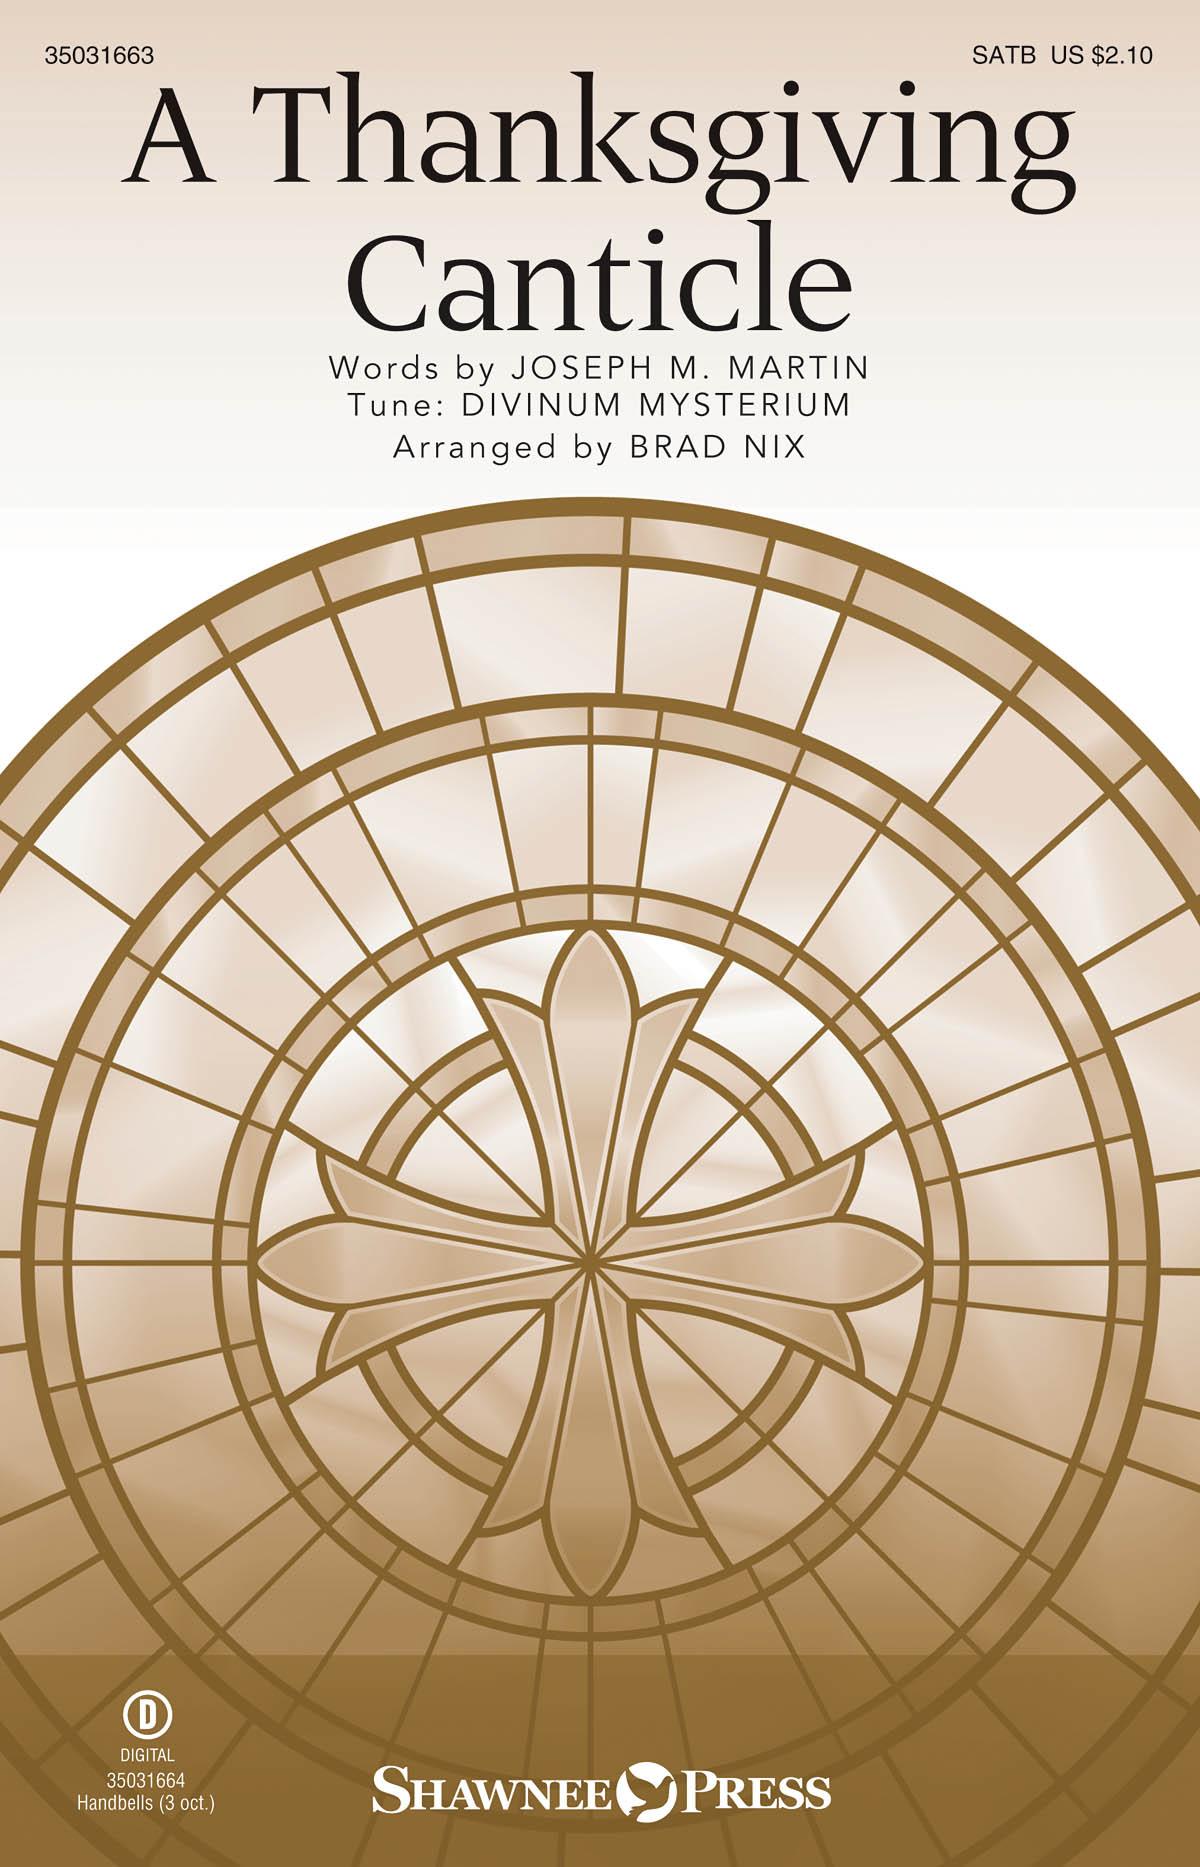 Joseph M. Martin Brad Nix: A Thanksgiving Canticle: SATB: Vocal Score